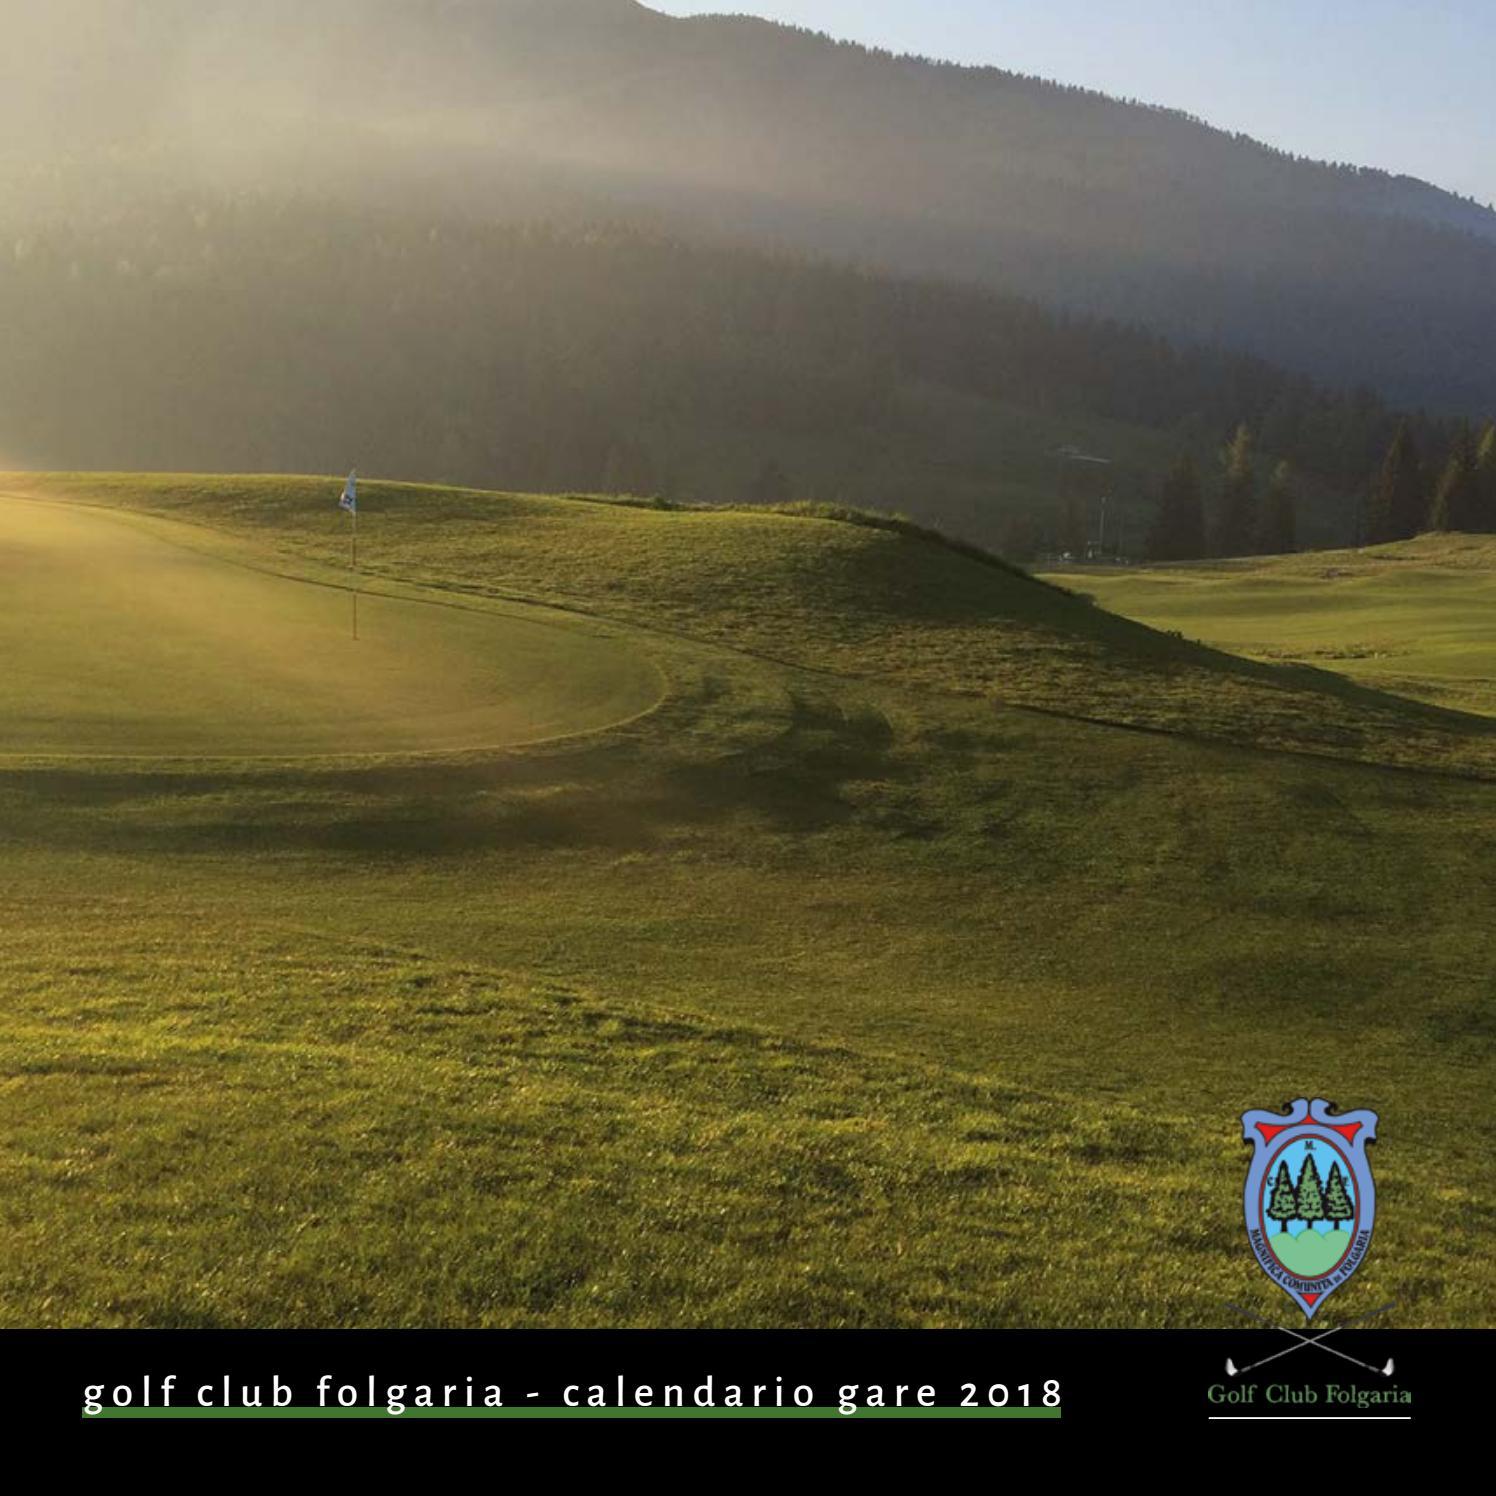 Acaya Golf Club Calendario Gare.Golf Club Folgaria Calendario Gara 2018 By Alpe Cimbra Issuu